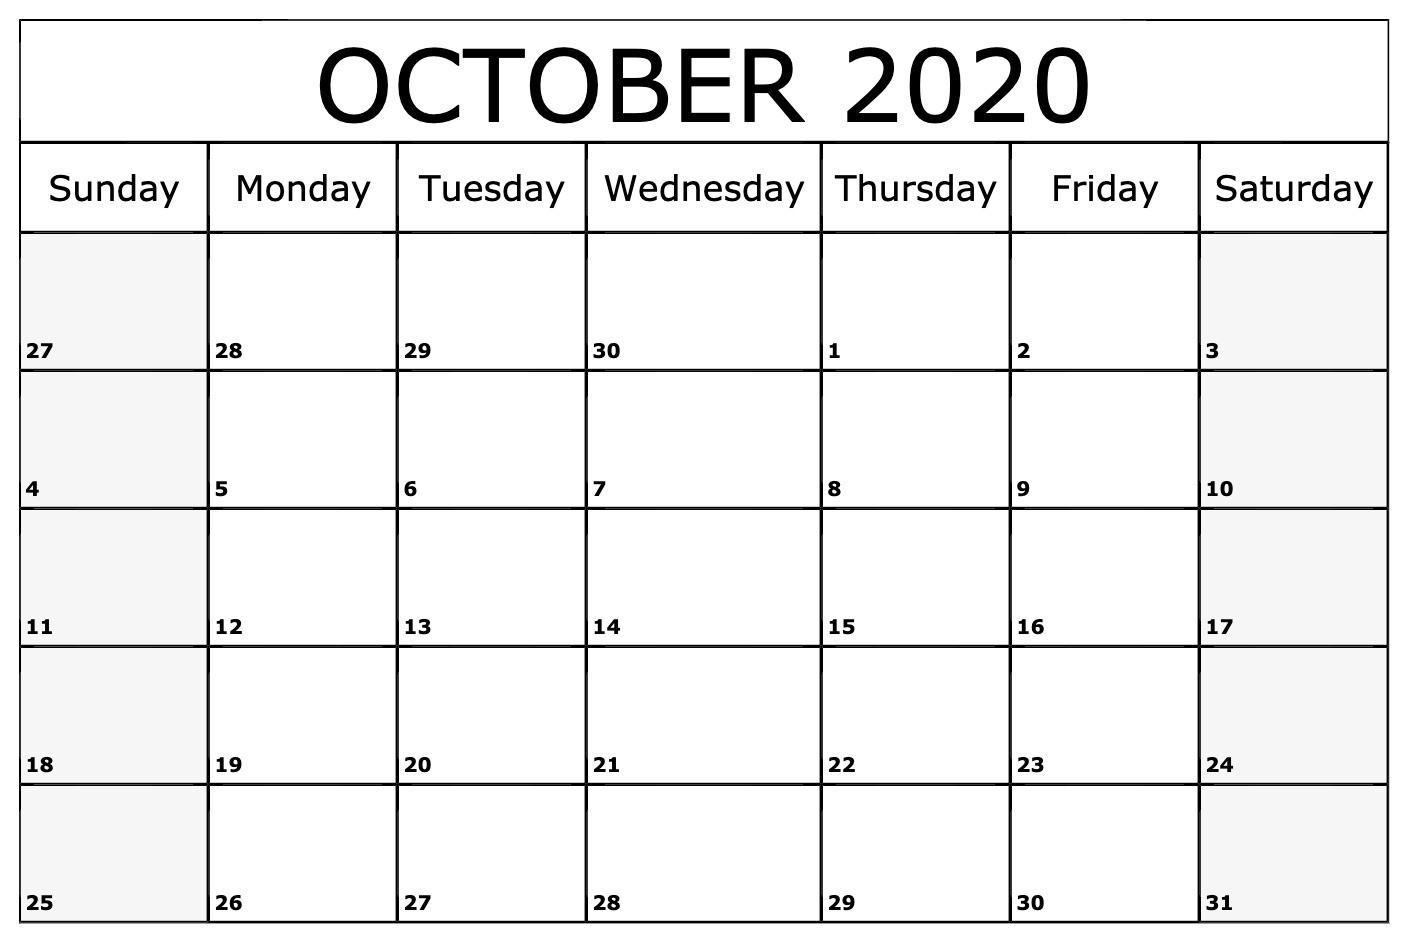 October Calendar 2020 | Calendar 2020-Printable Jewish Calendar For October 2020 With Holidays